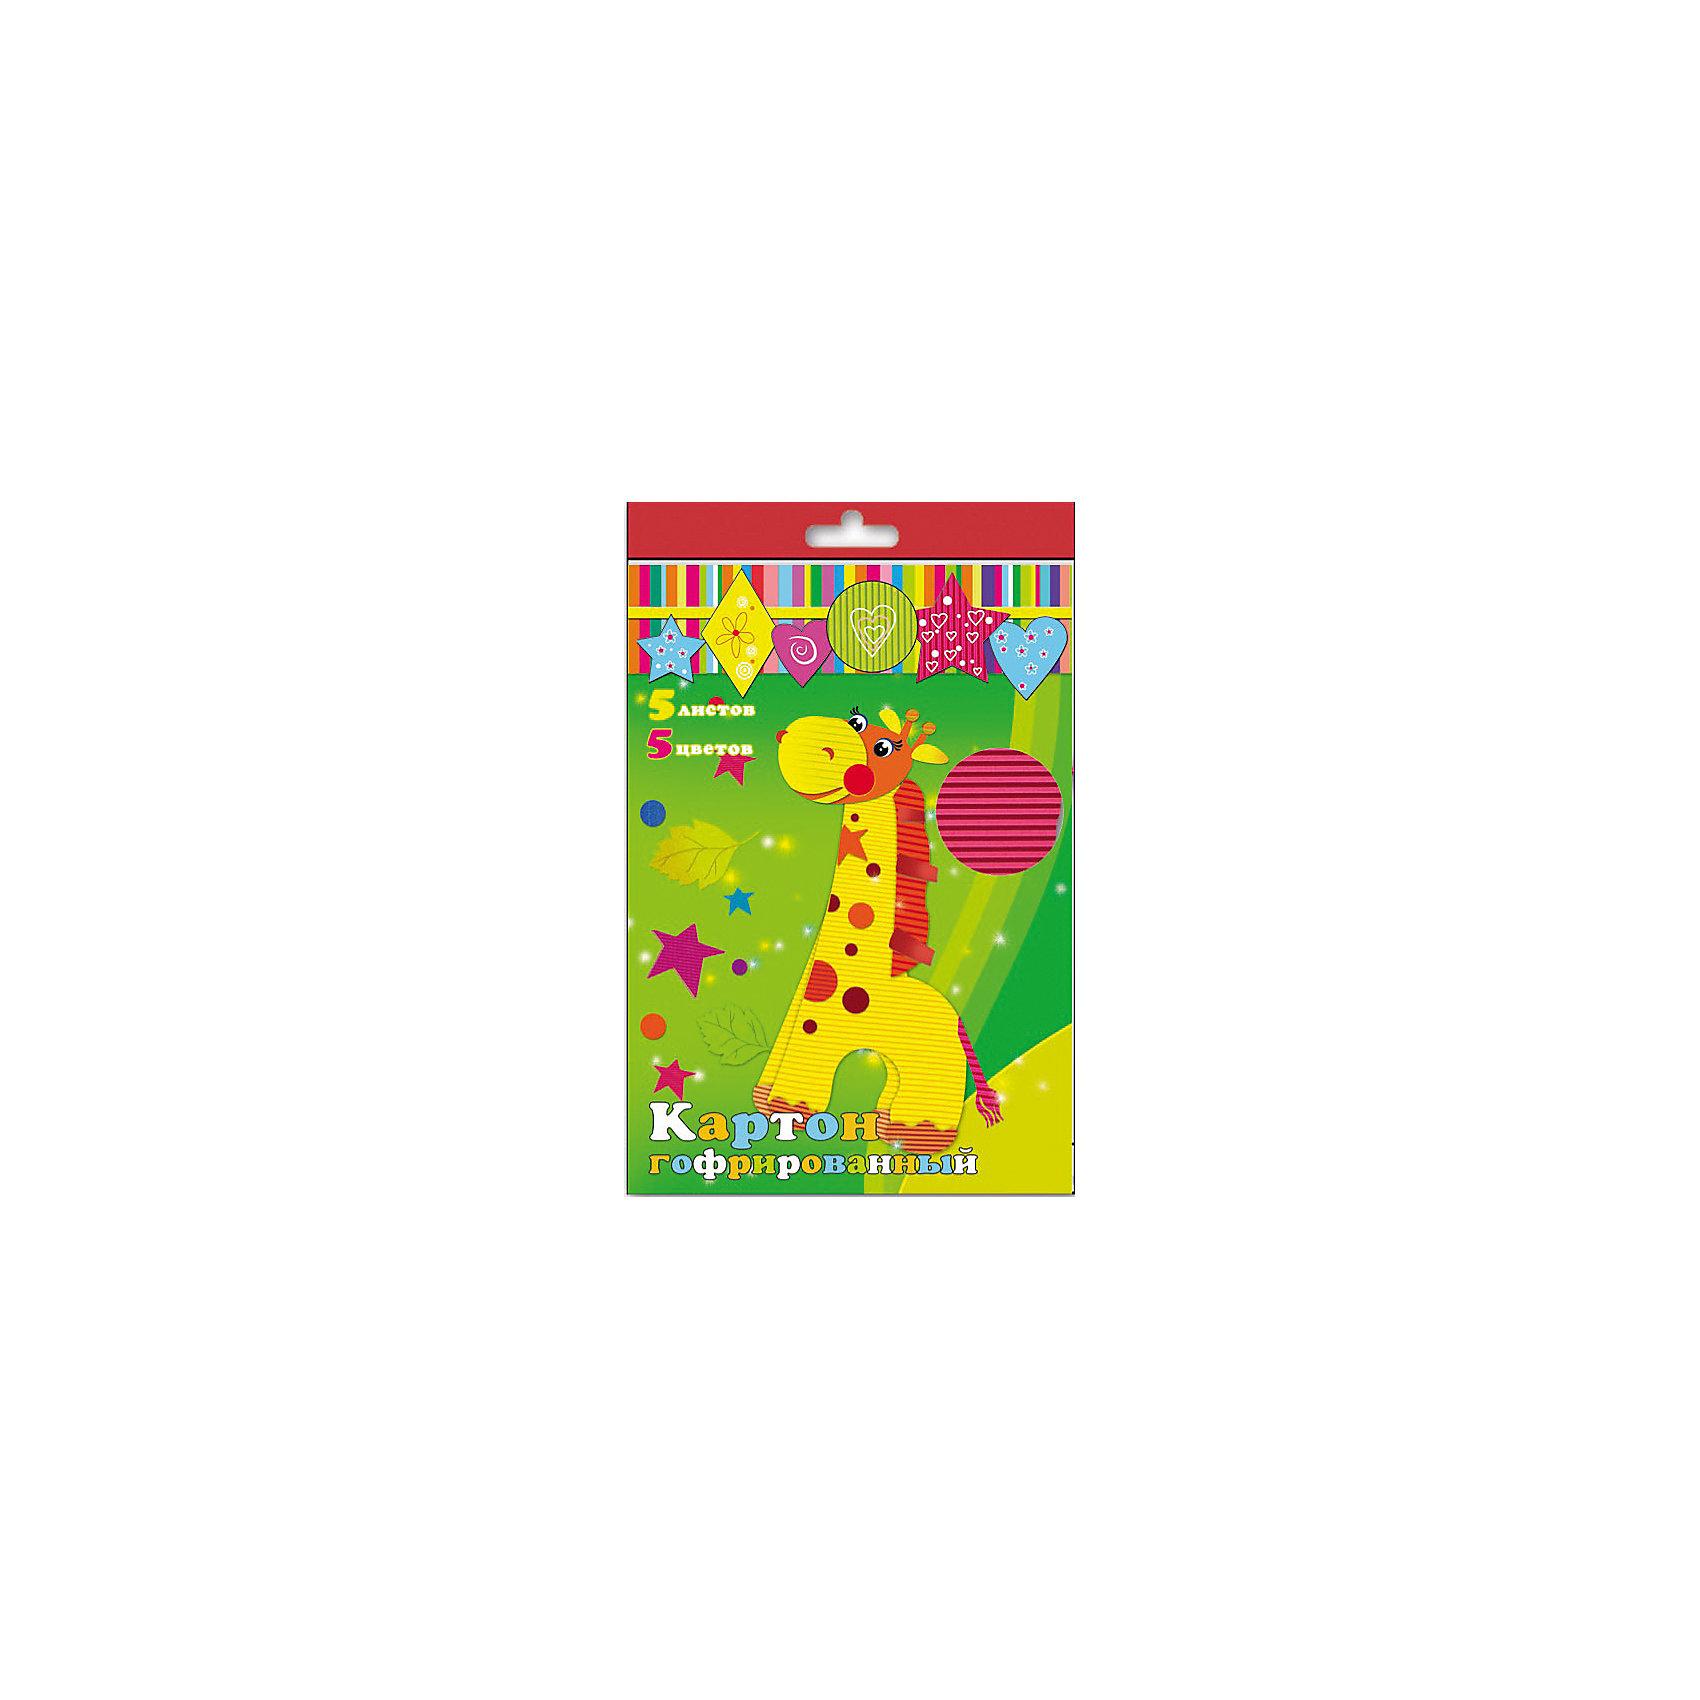 Феникс+ Картон гофрированный , 5 листов феникс картон гофрированный с глиттерным напылением